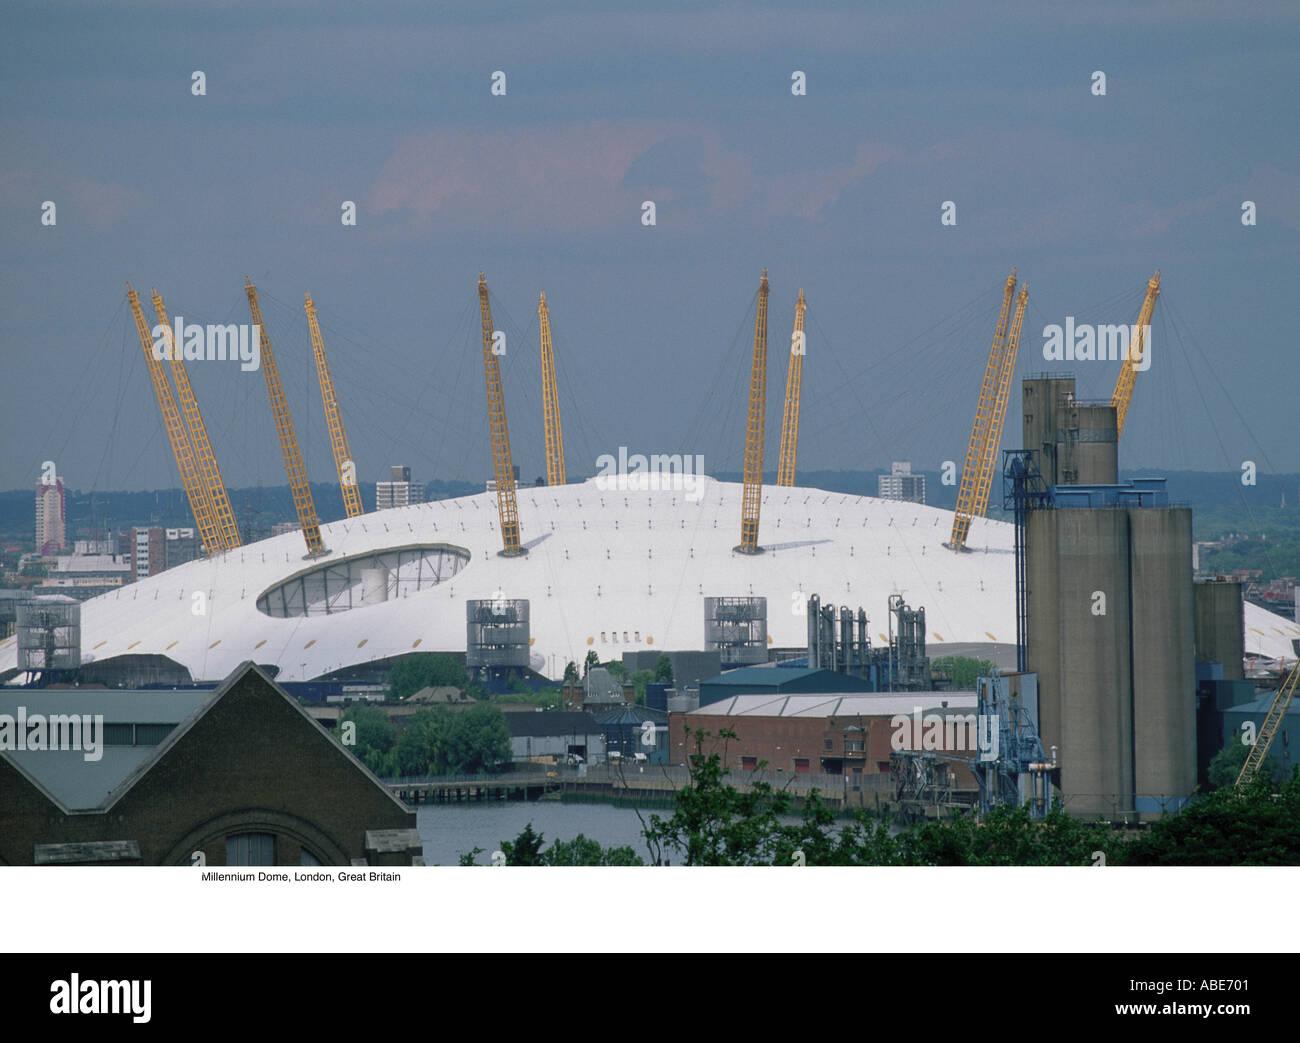 Millennium Dome, London, Great Britain - Stock Image